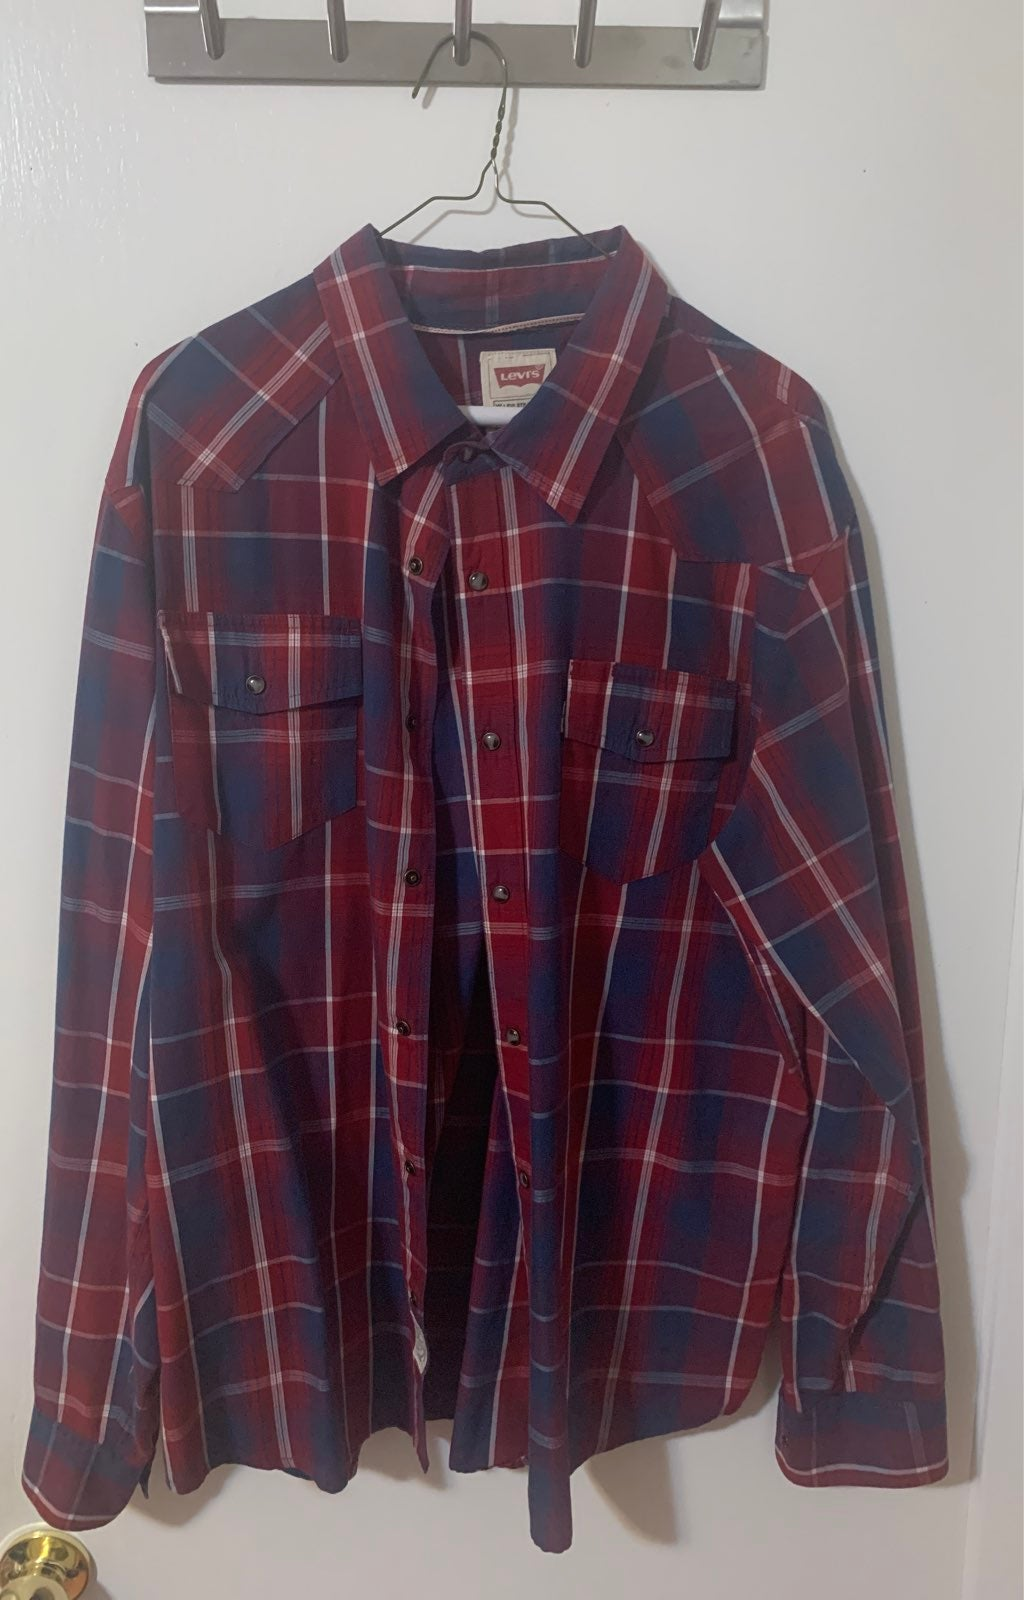 Vintage Levi's Flannel